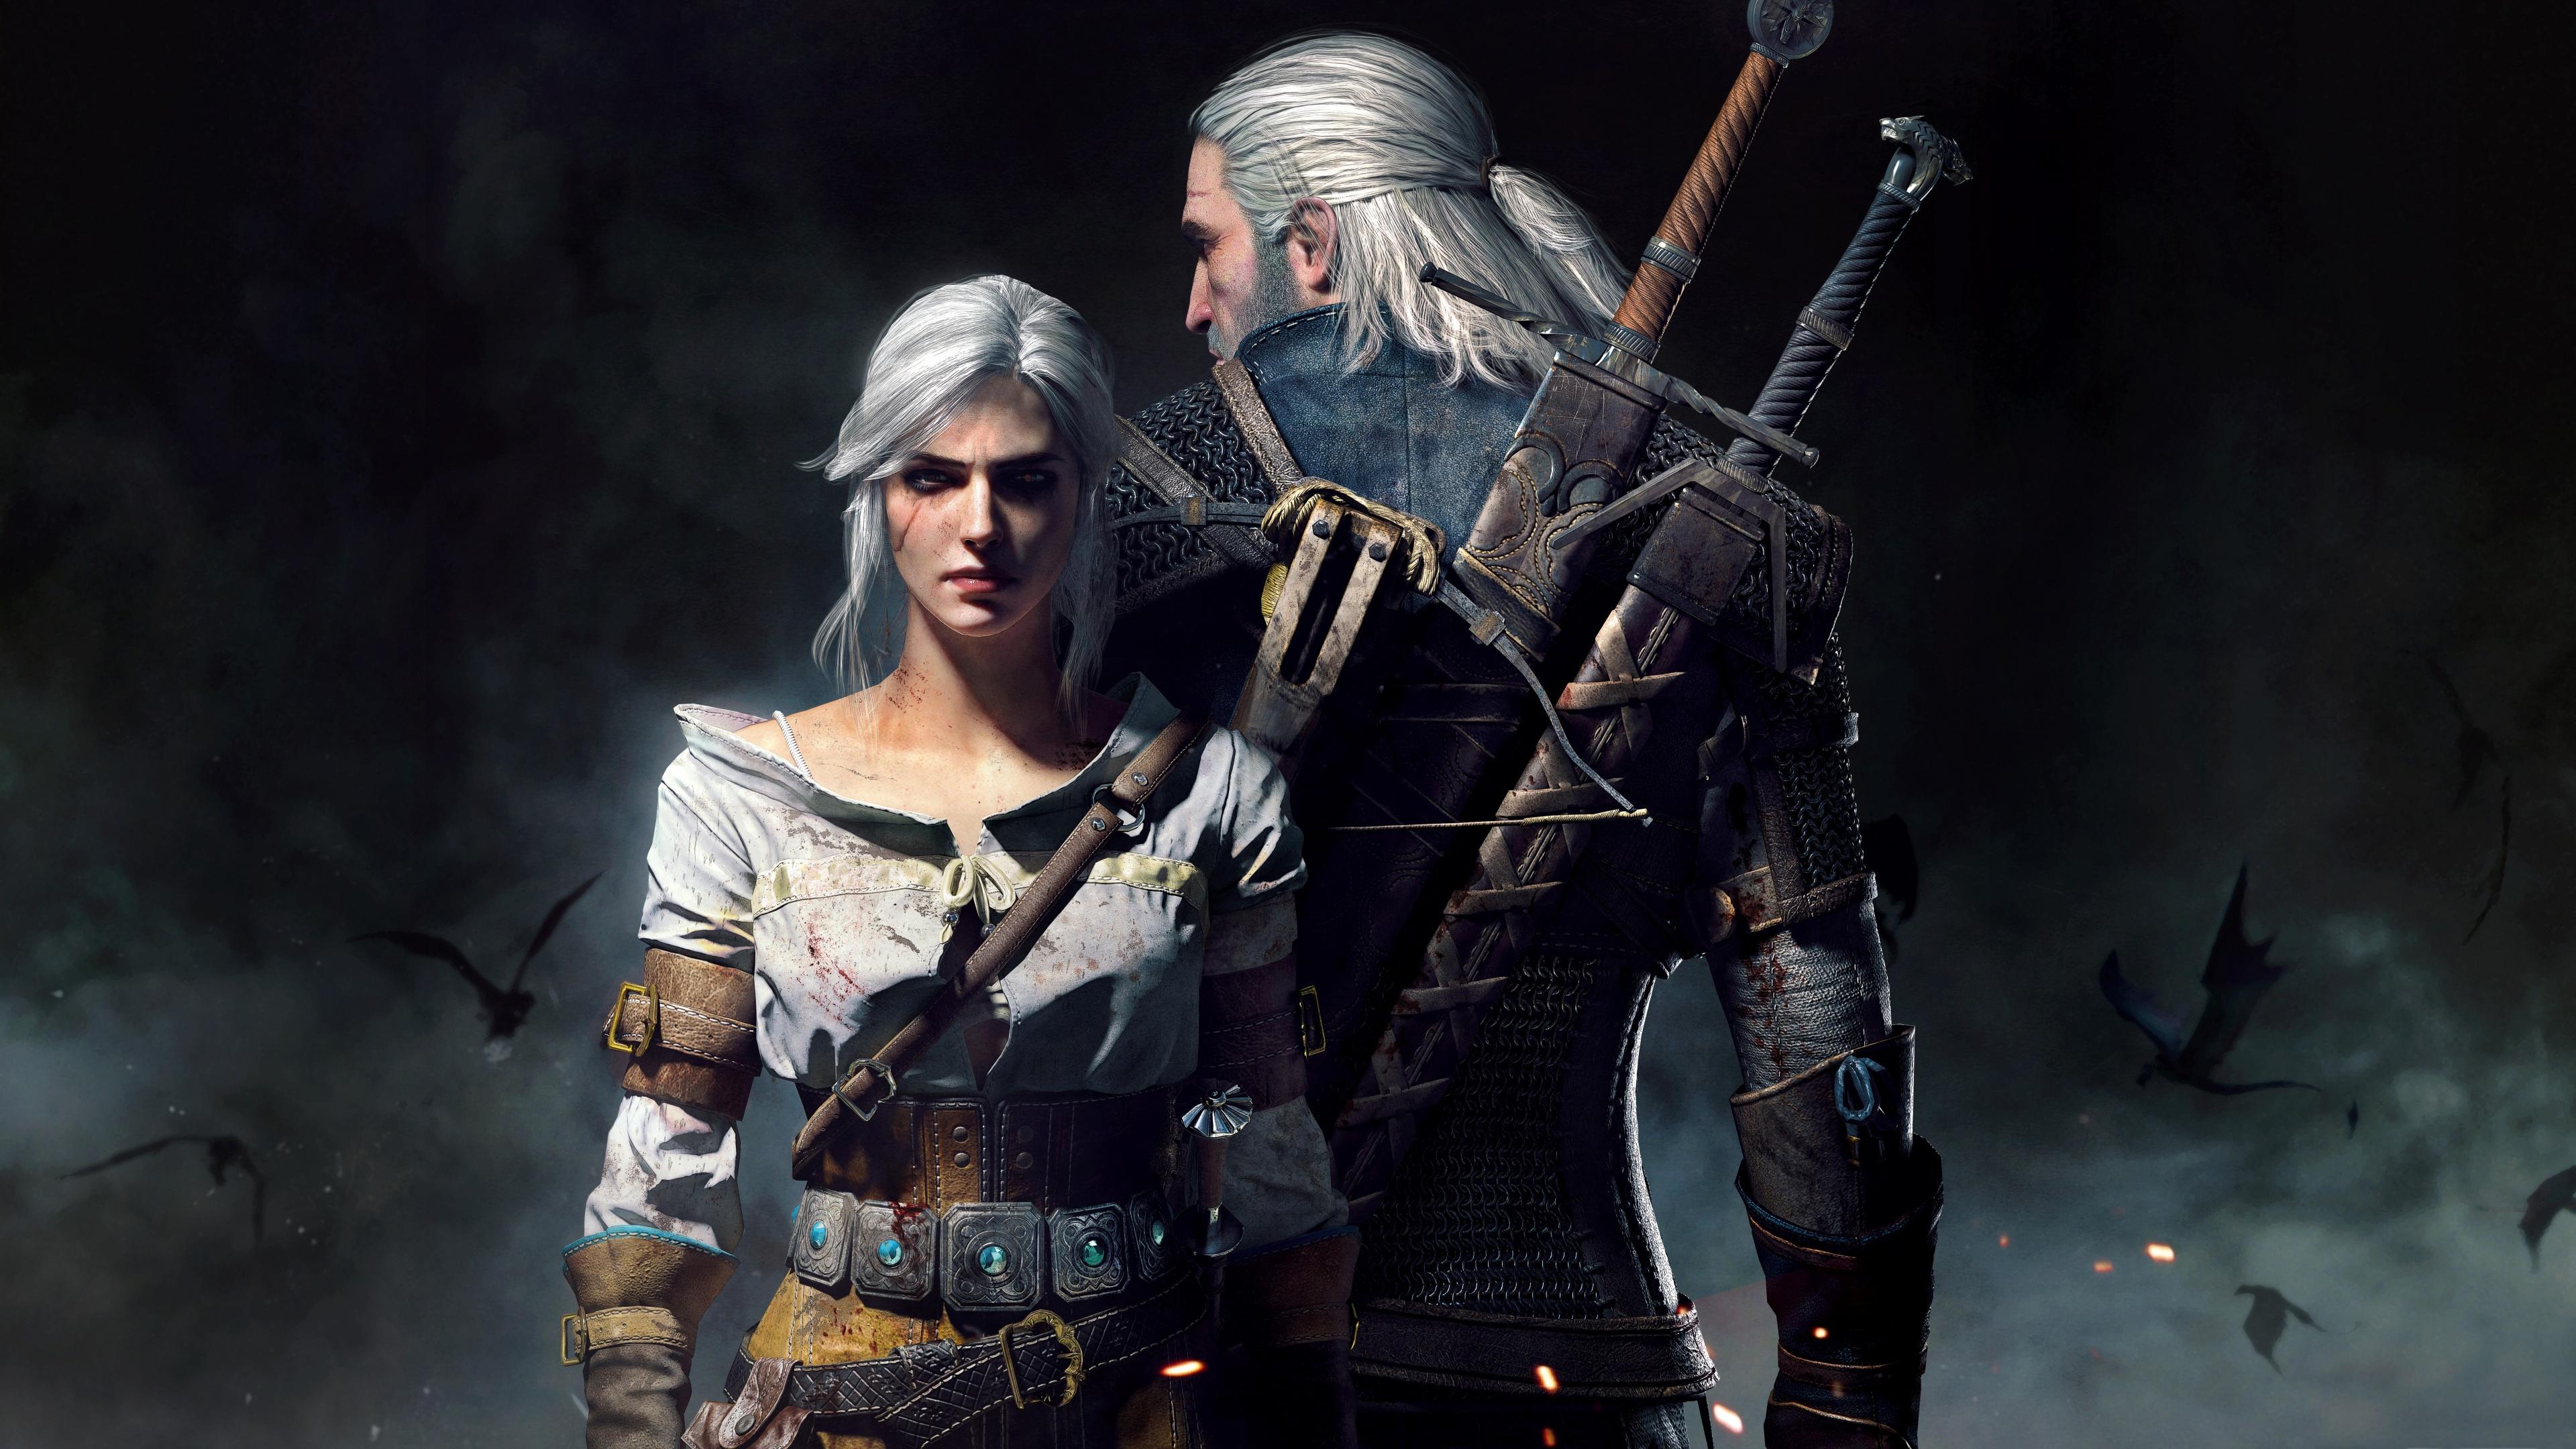 The-Witcher-Geralt-and-Ciri-x-wallpaper-wpc5809453